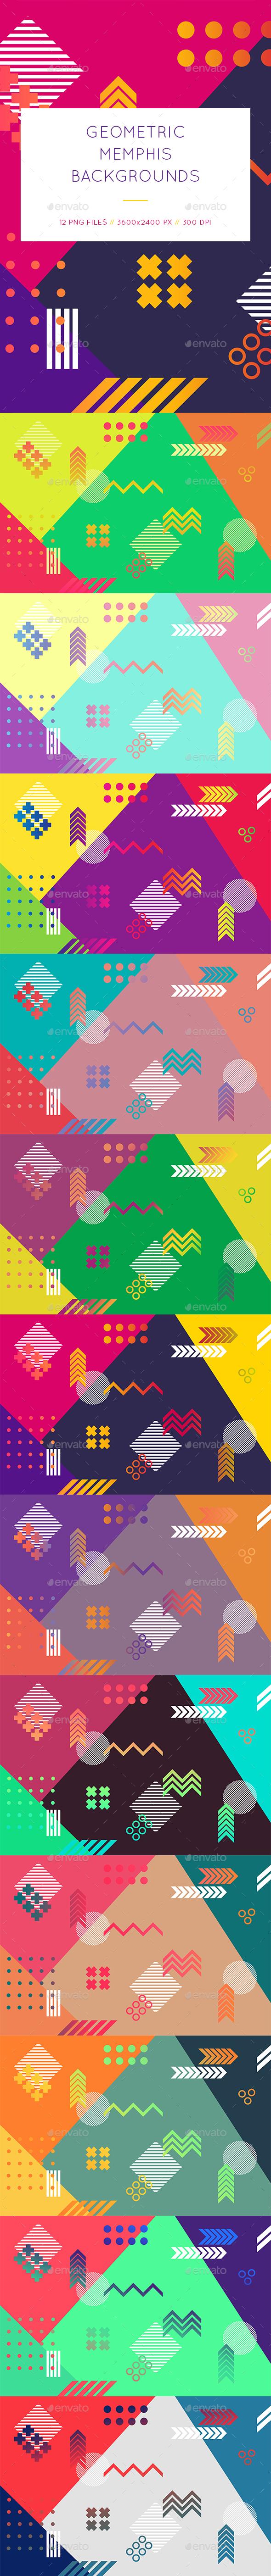 Geometric Memphis Backgrounds